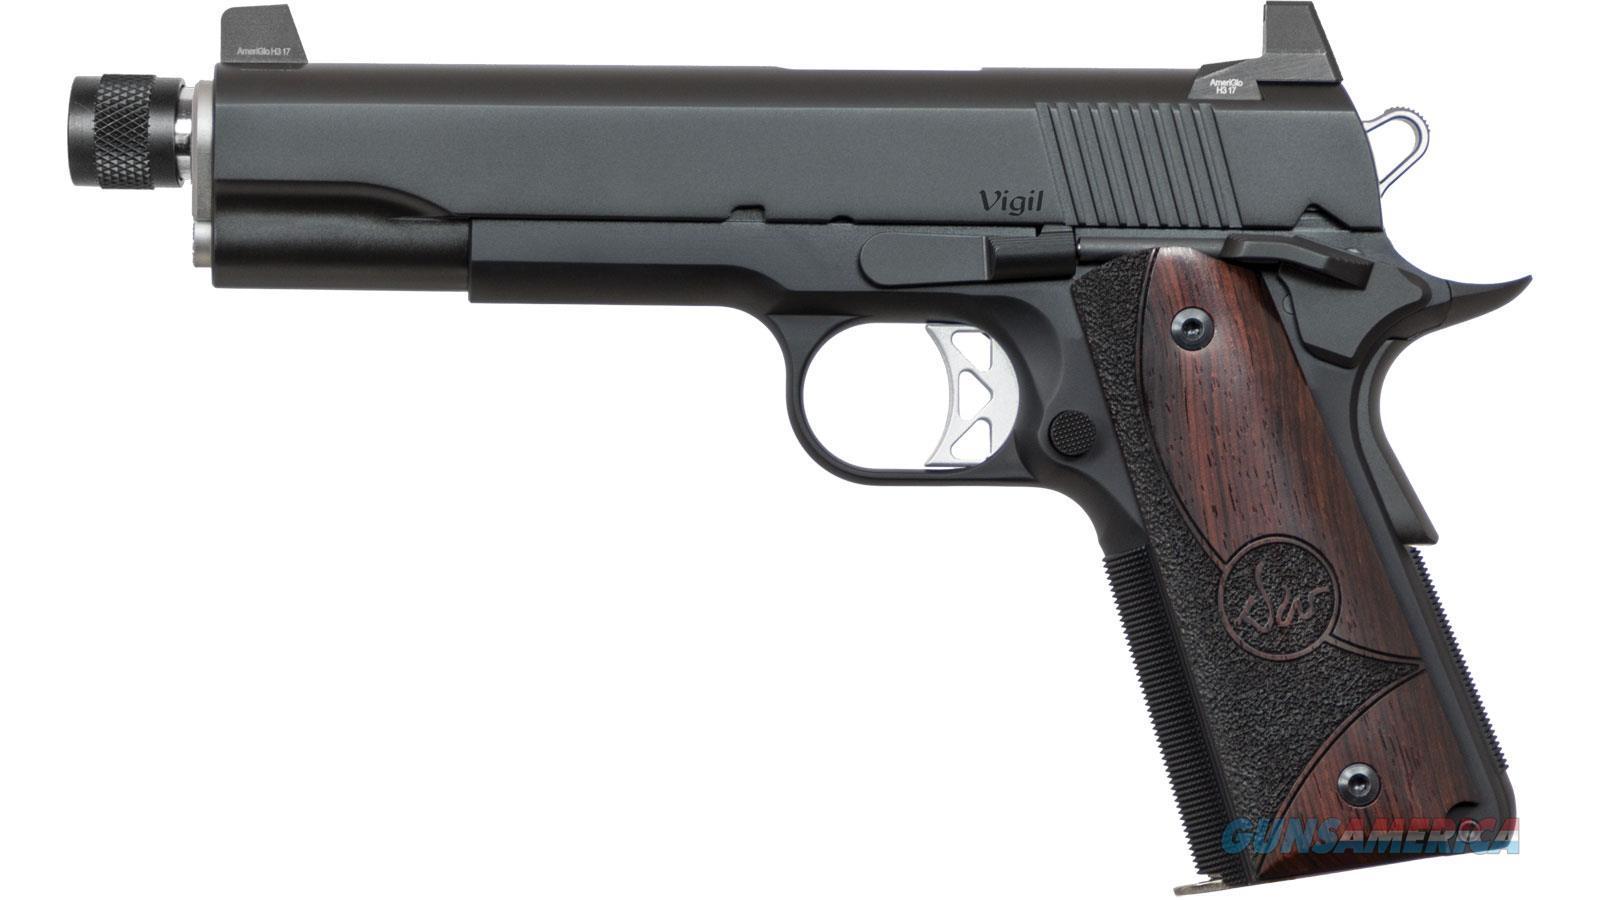 Dan Wesson Dw Vigil Suppressor Ready 01831  Guns > Pistols > C Misc Pistols